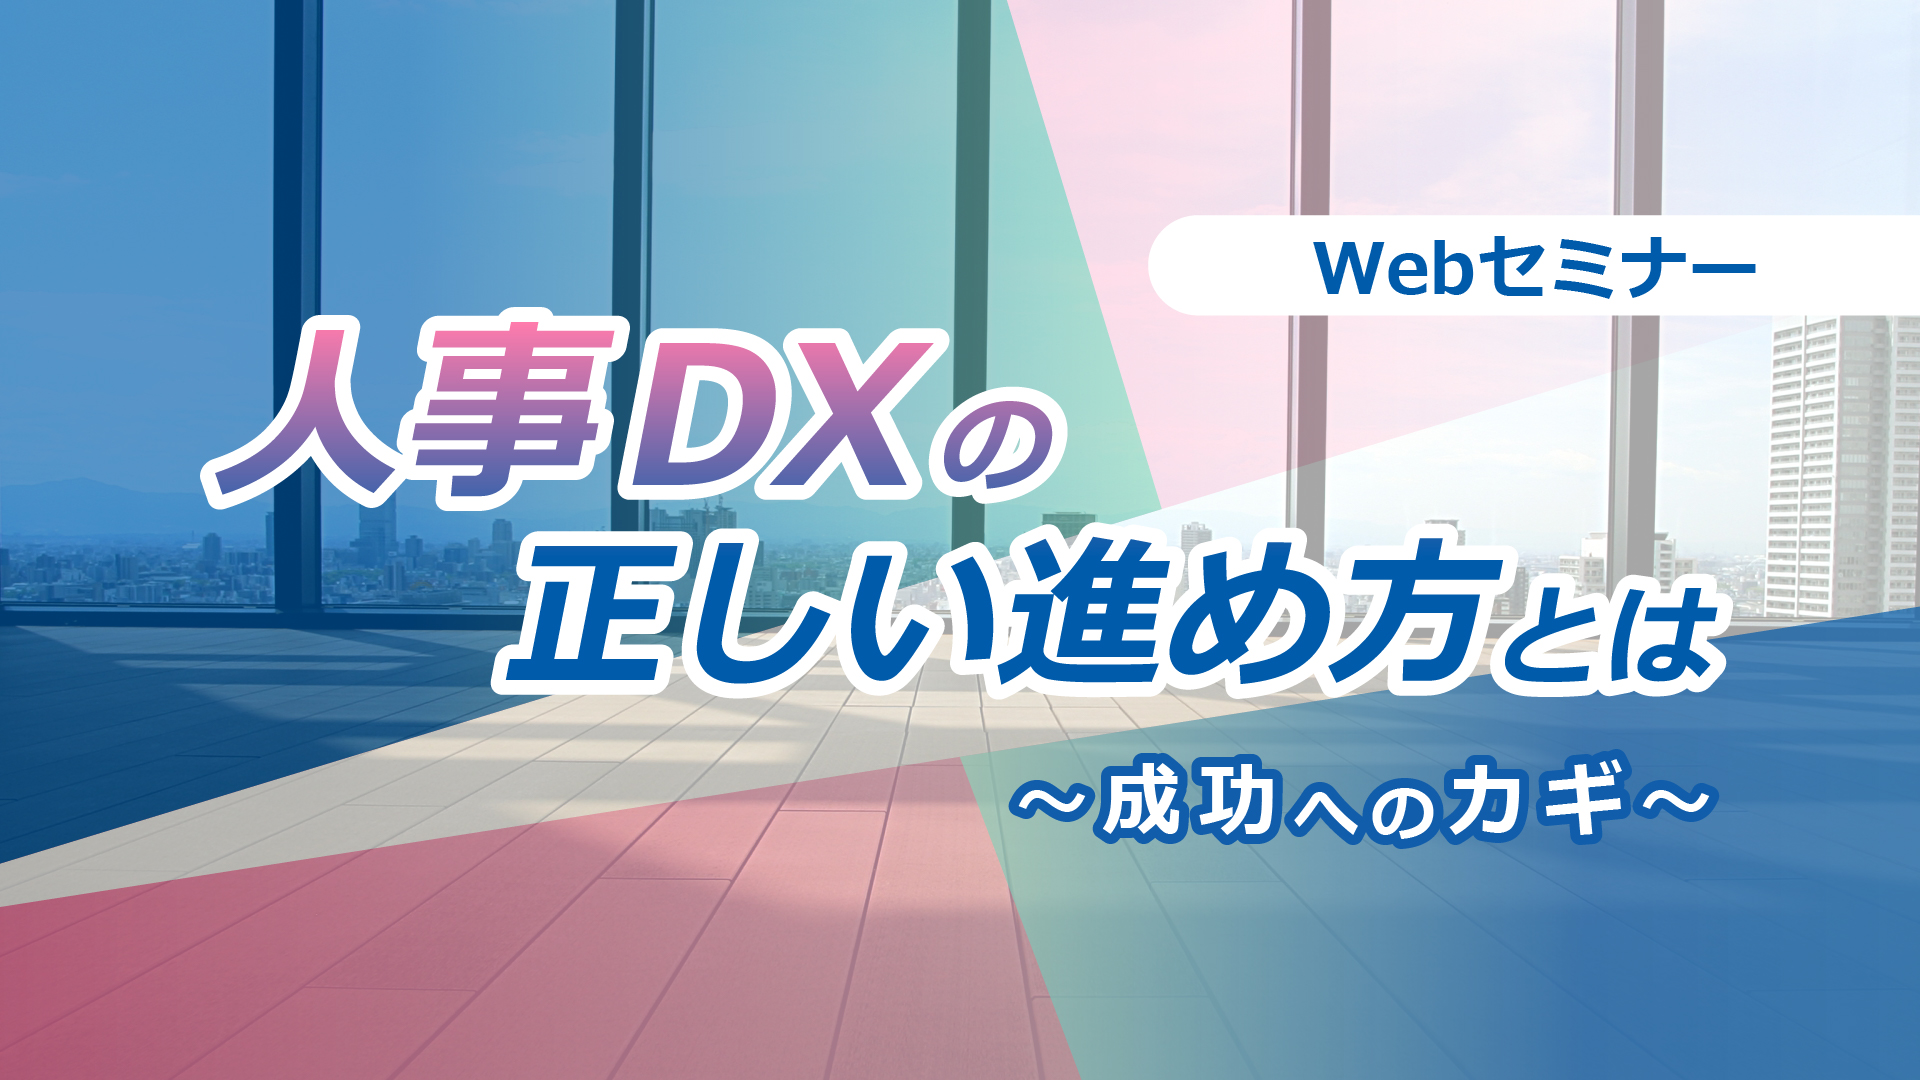 【Webセミナー】10/ 5開催!人事DXの正しい進め方とは~成功へのカギ~